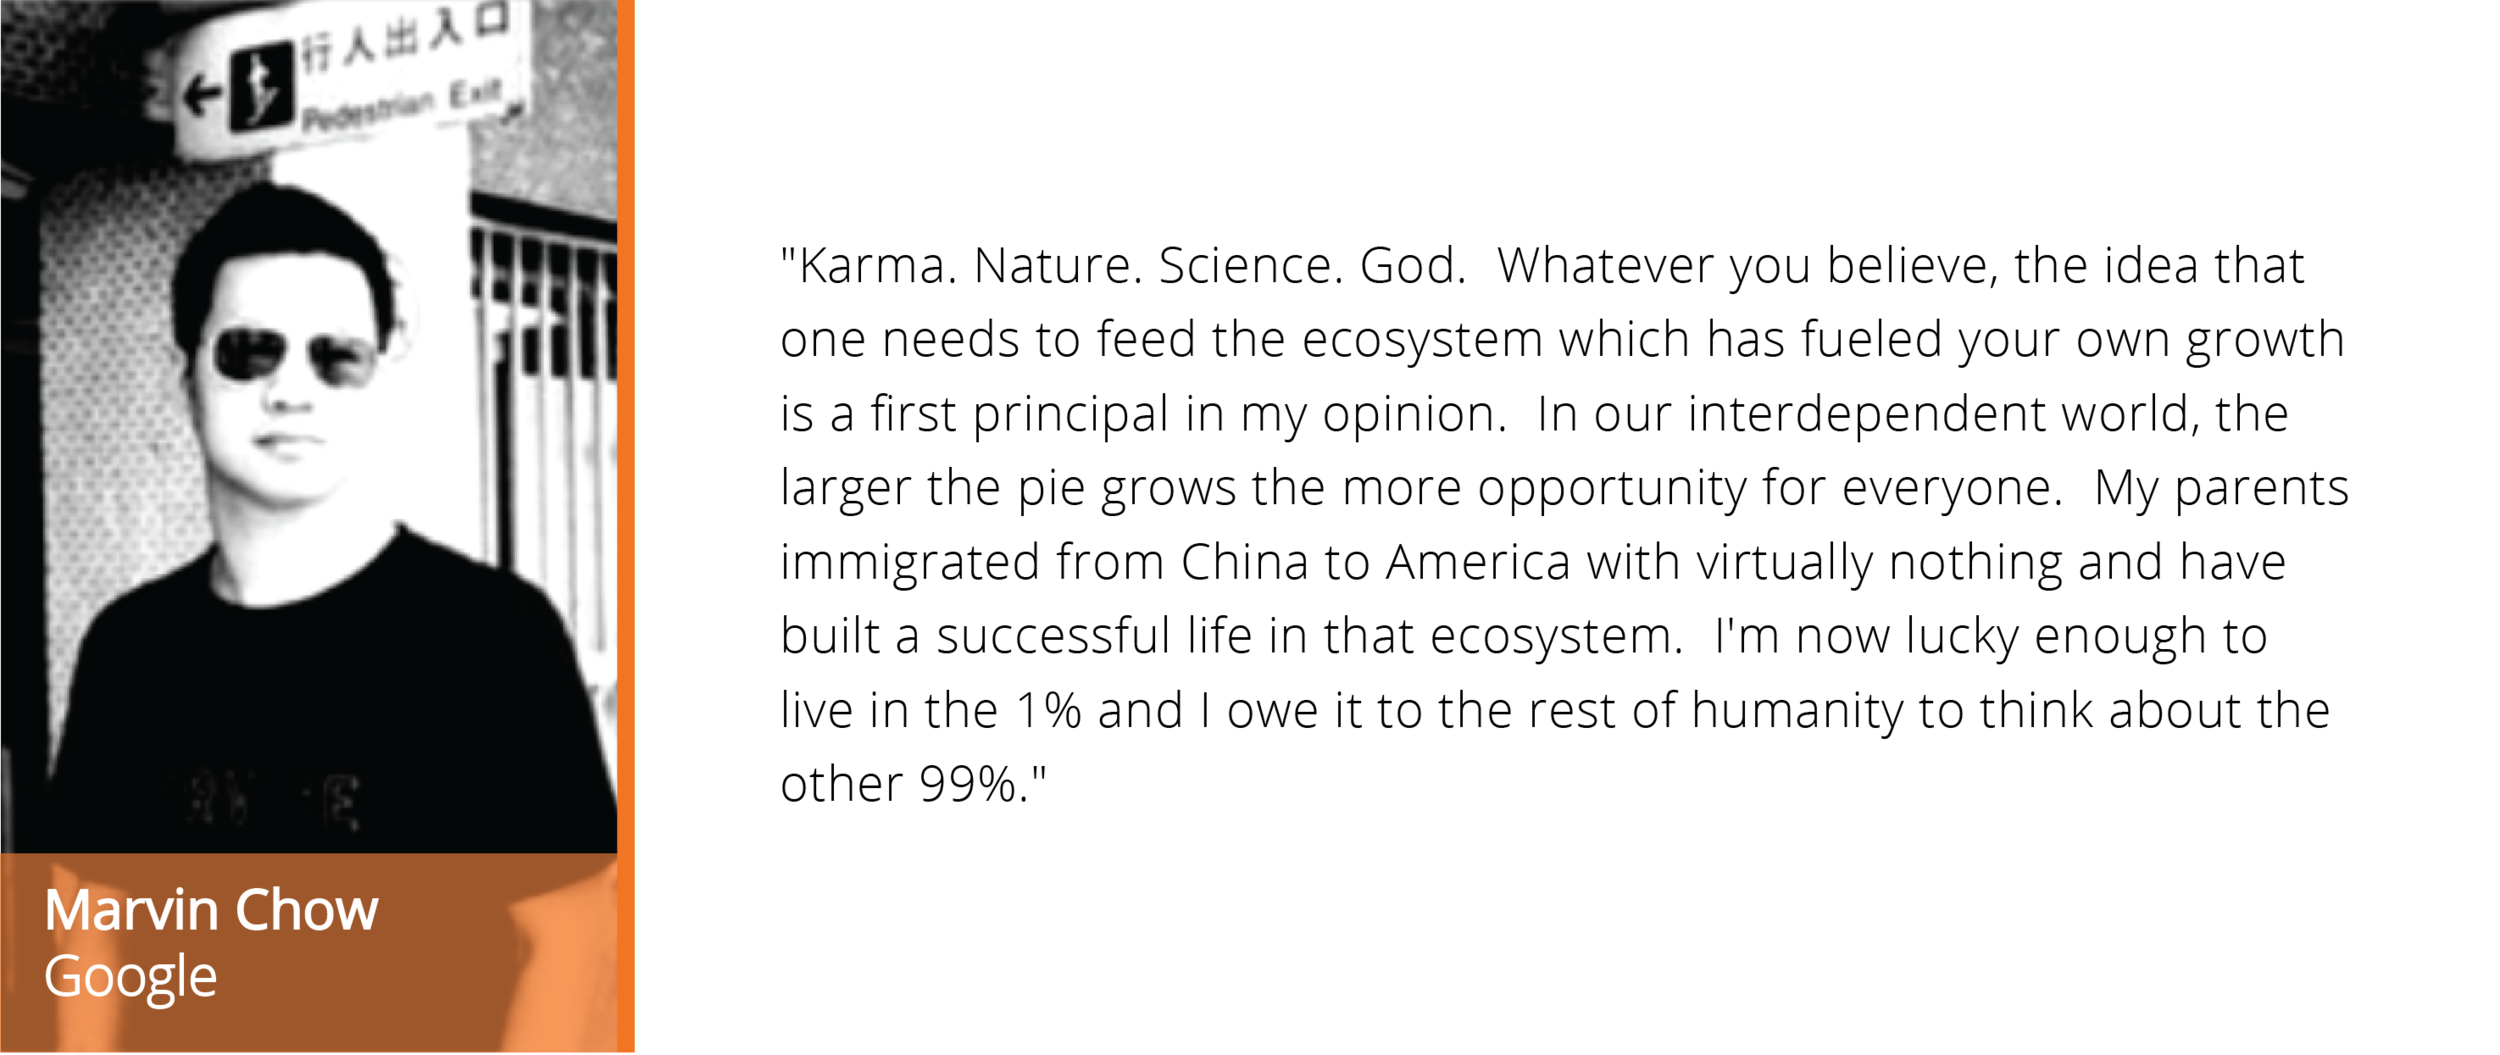 MC_02-02.png